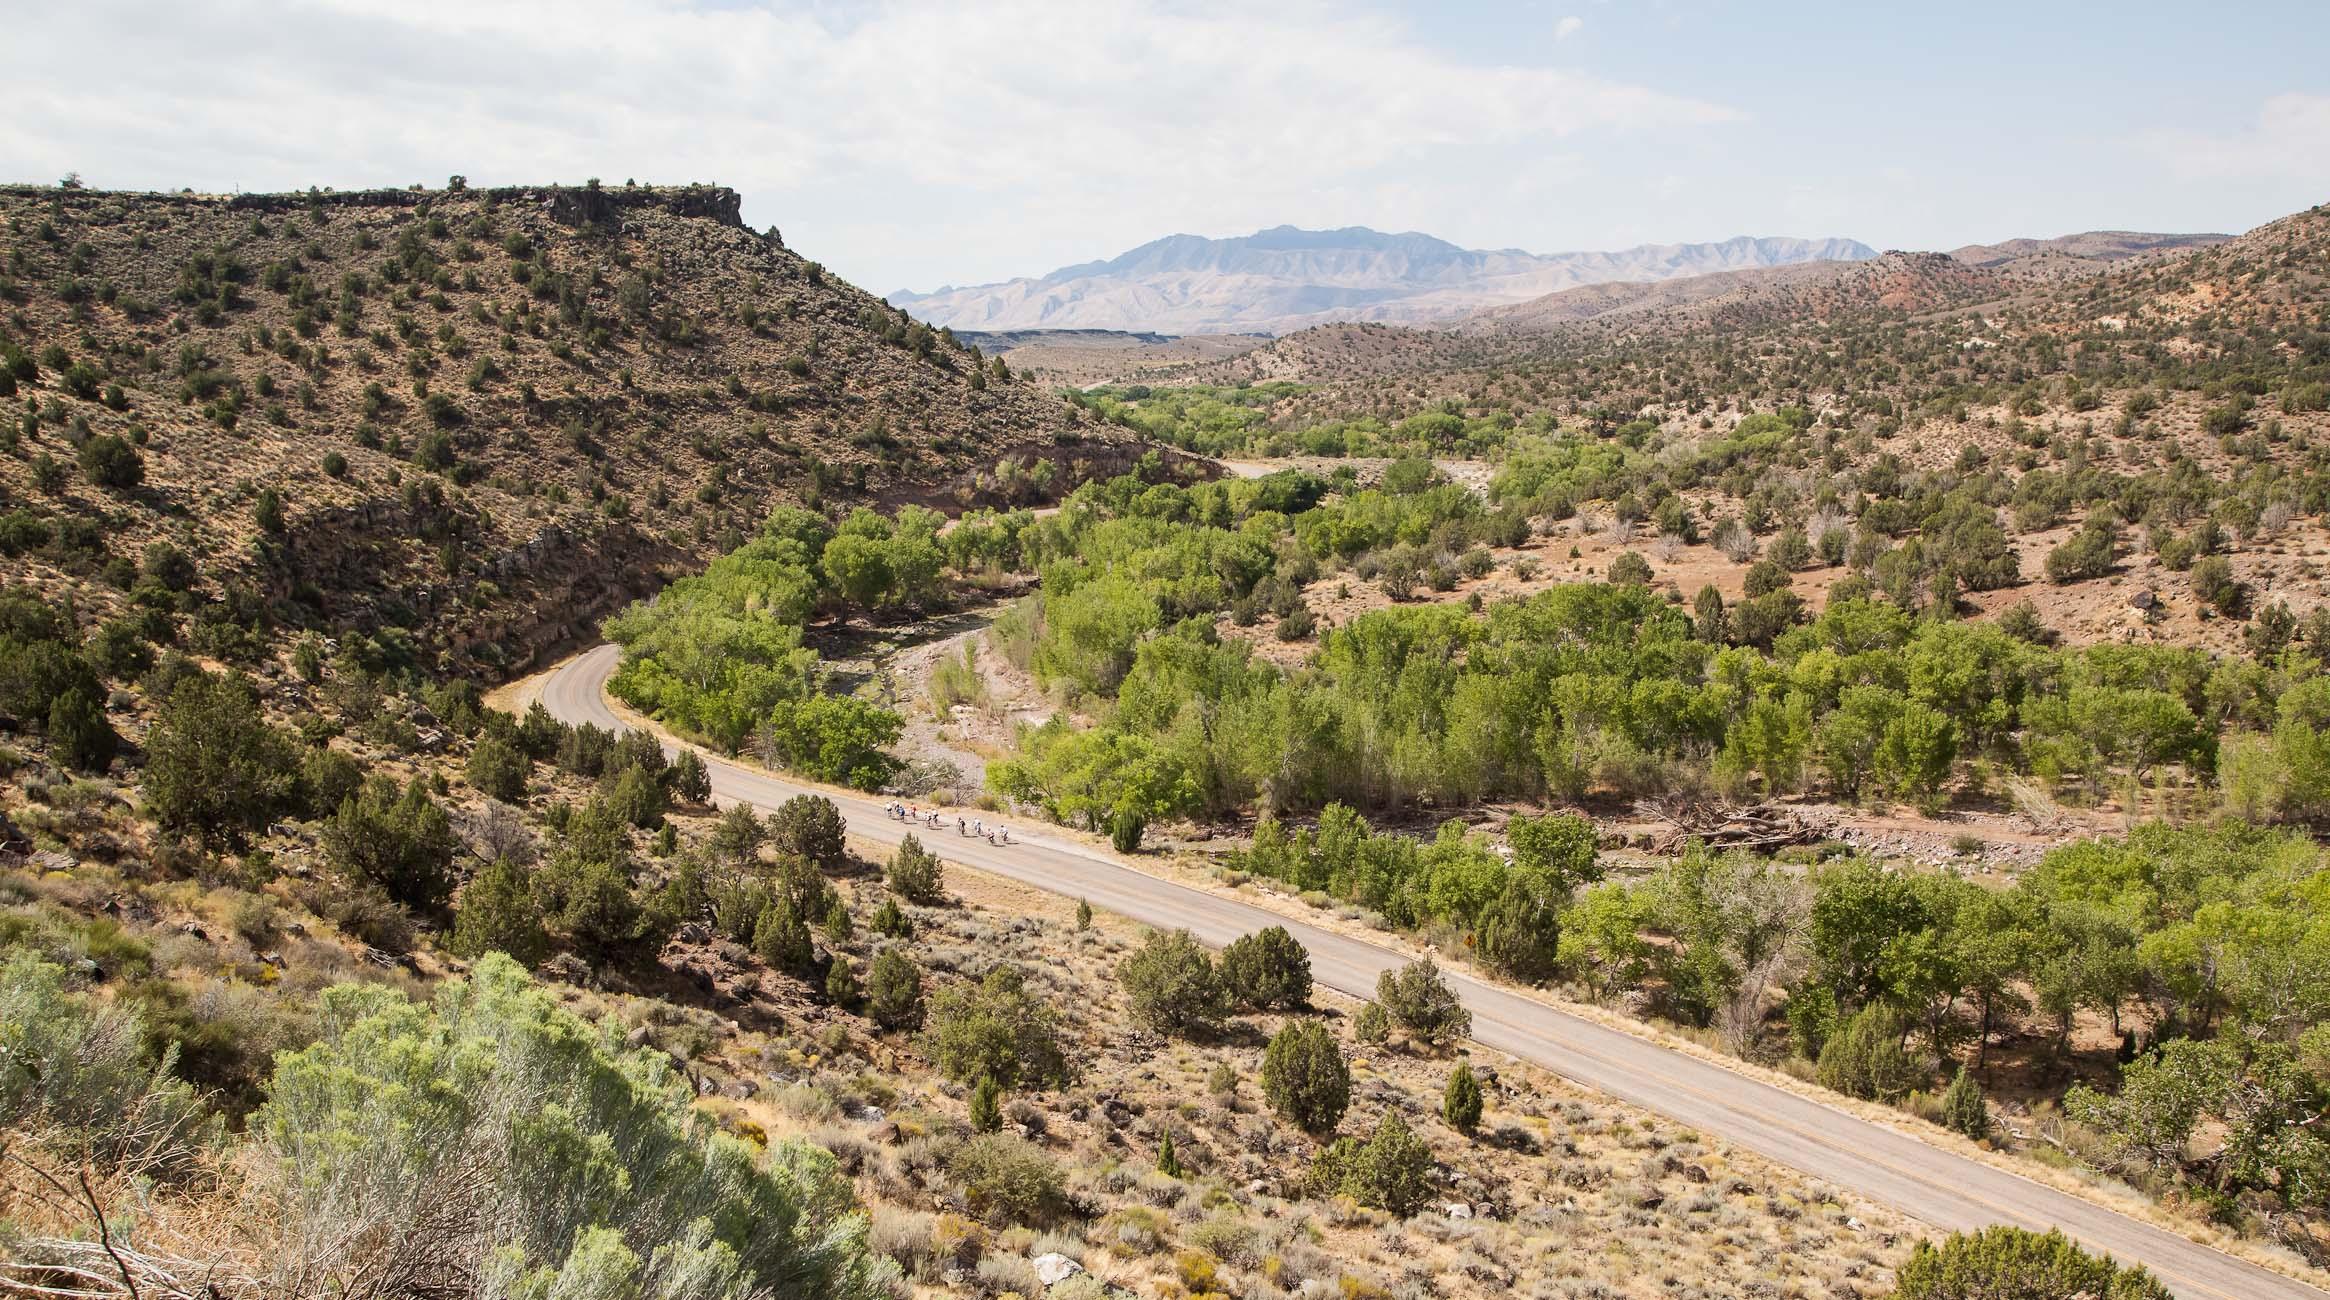 Riding into the Utah Desert on the Ride to Vegas